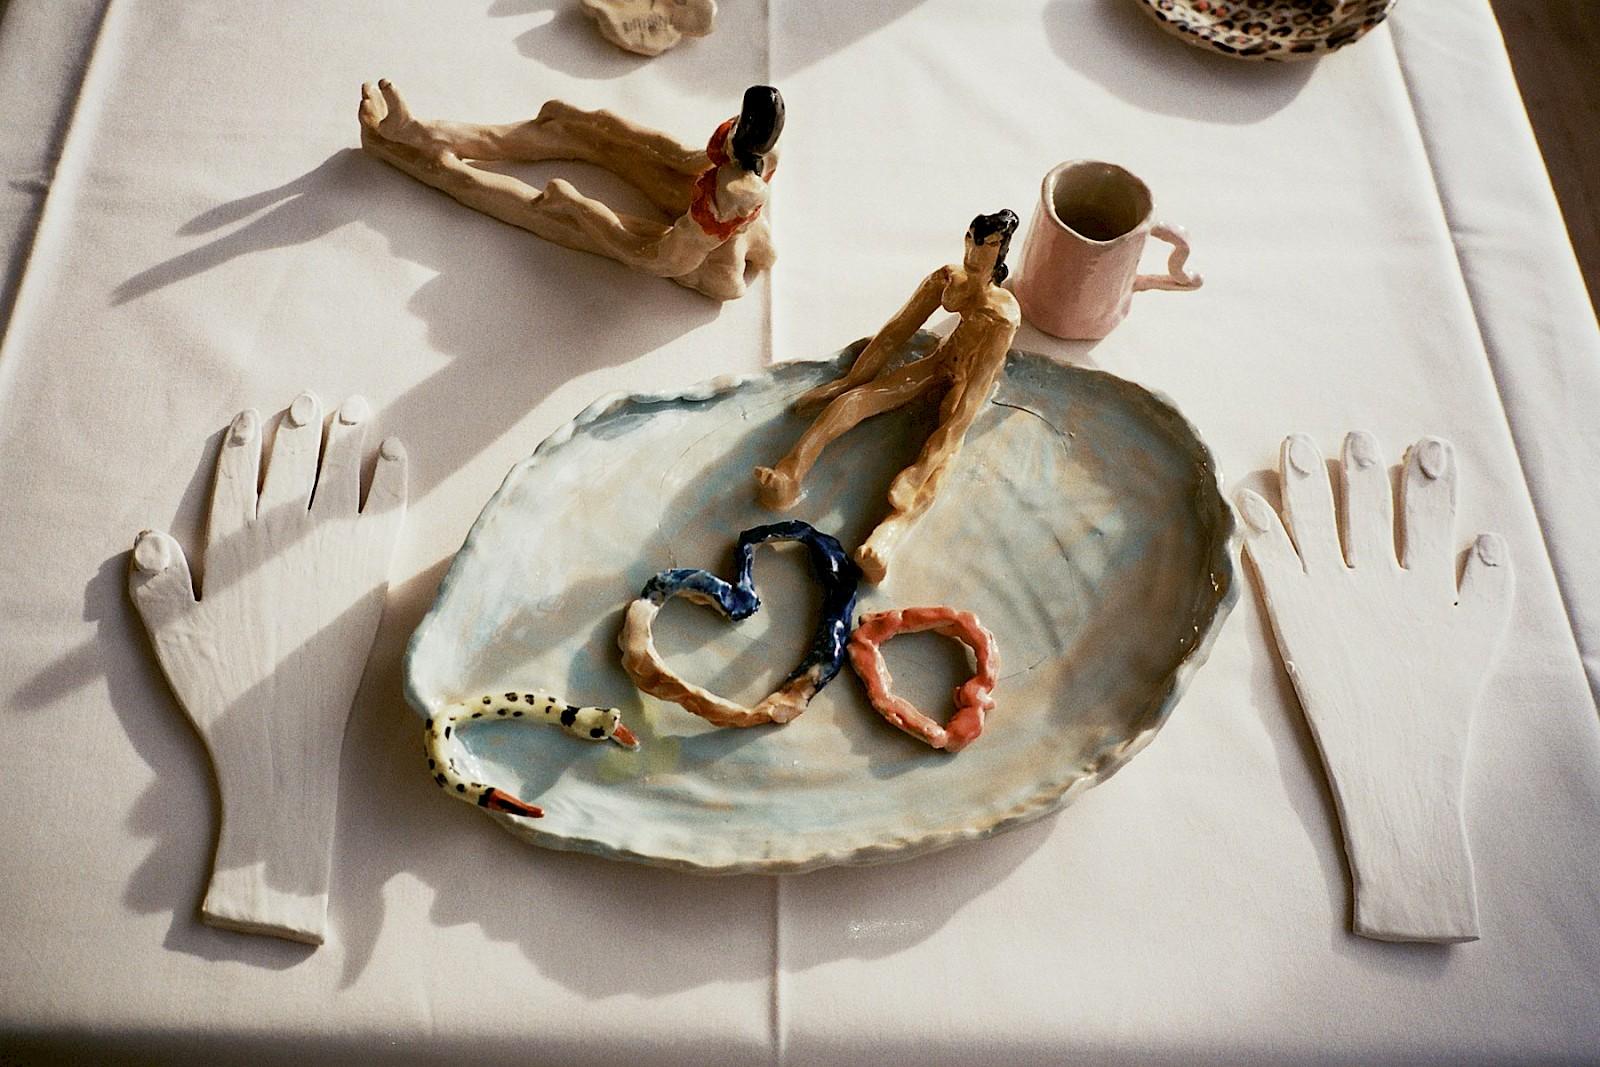 Image - Ceramics by Heinz Lauener